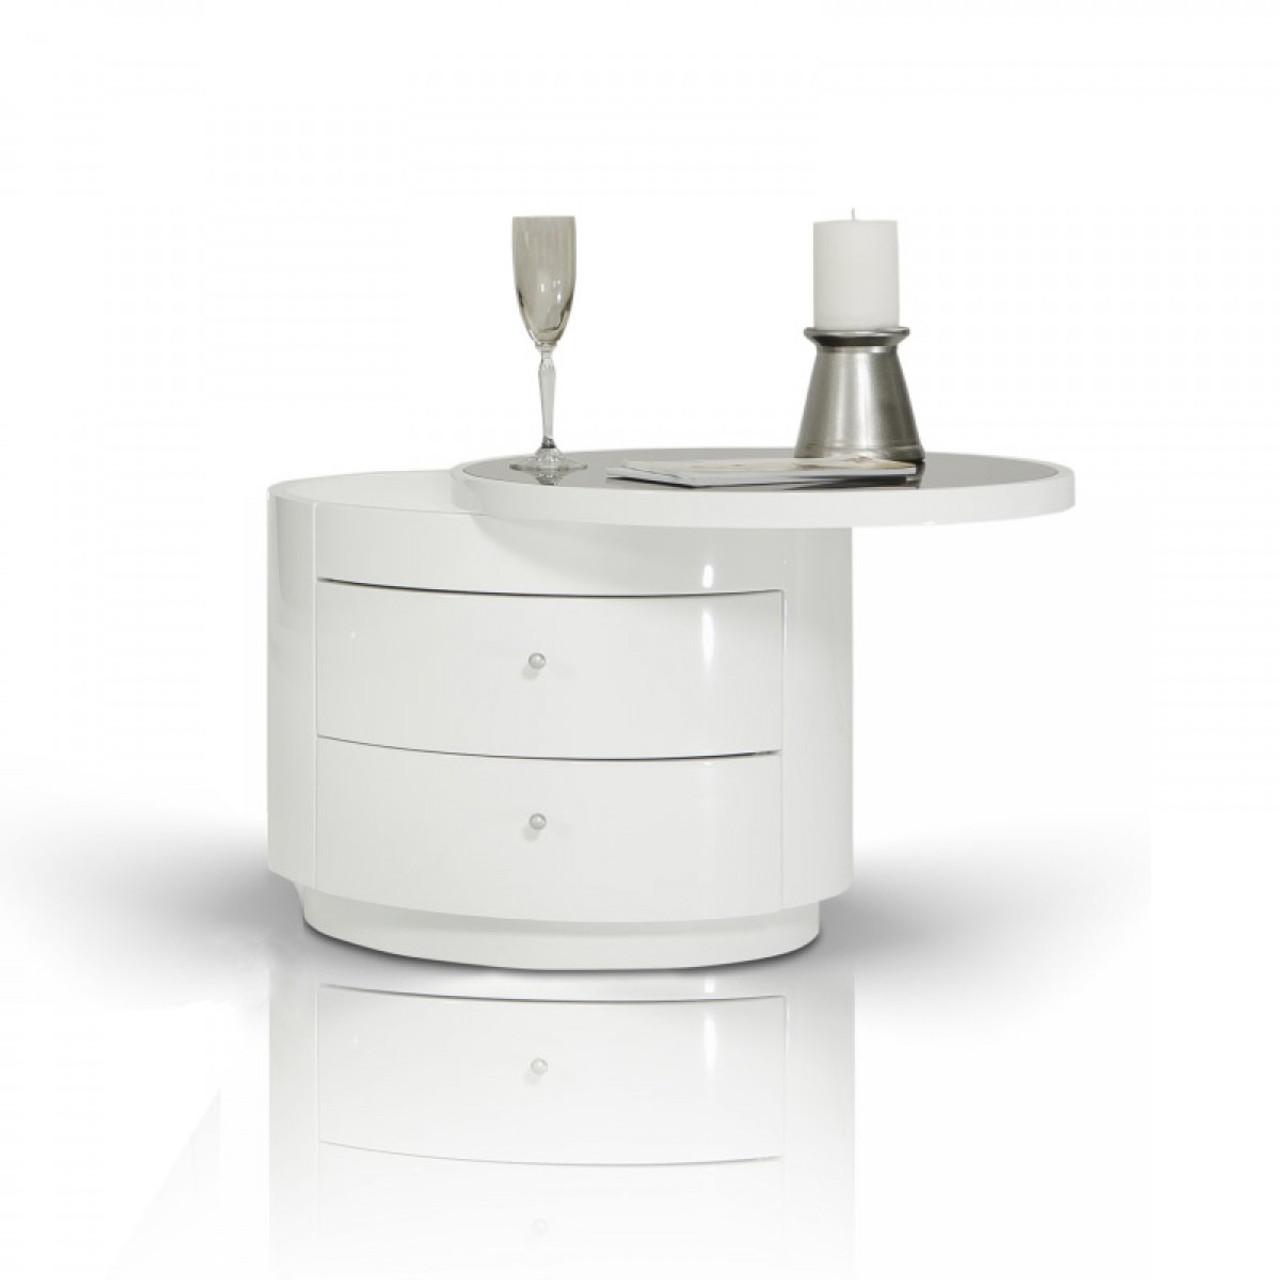 Modrest Symphony - Modern White Round Nightstand - Lounge LA